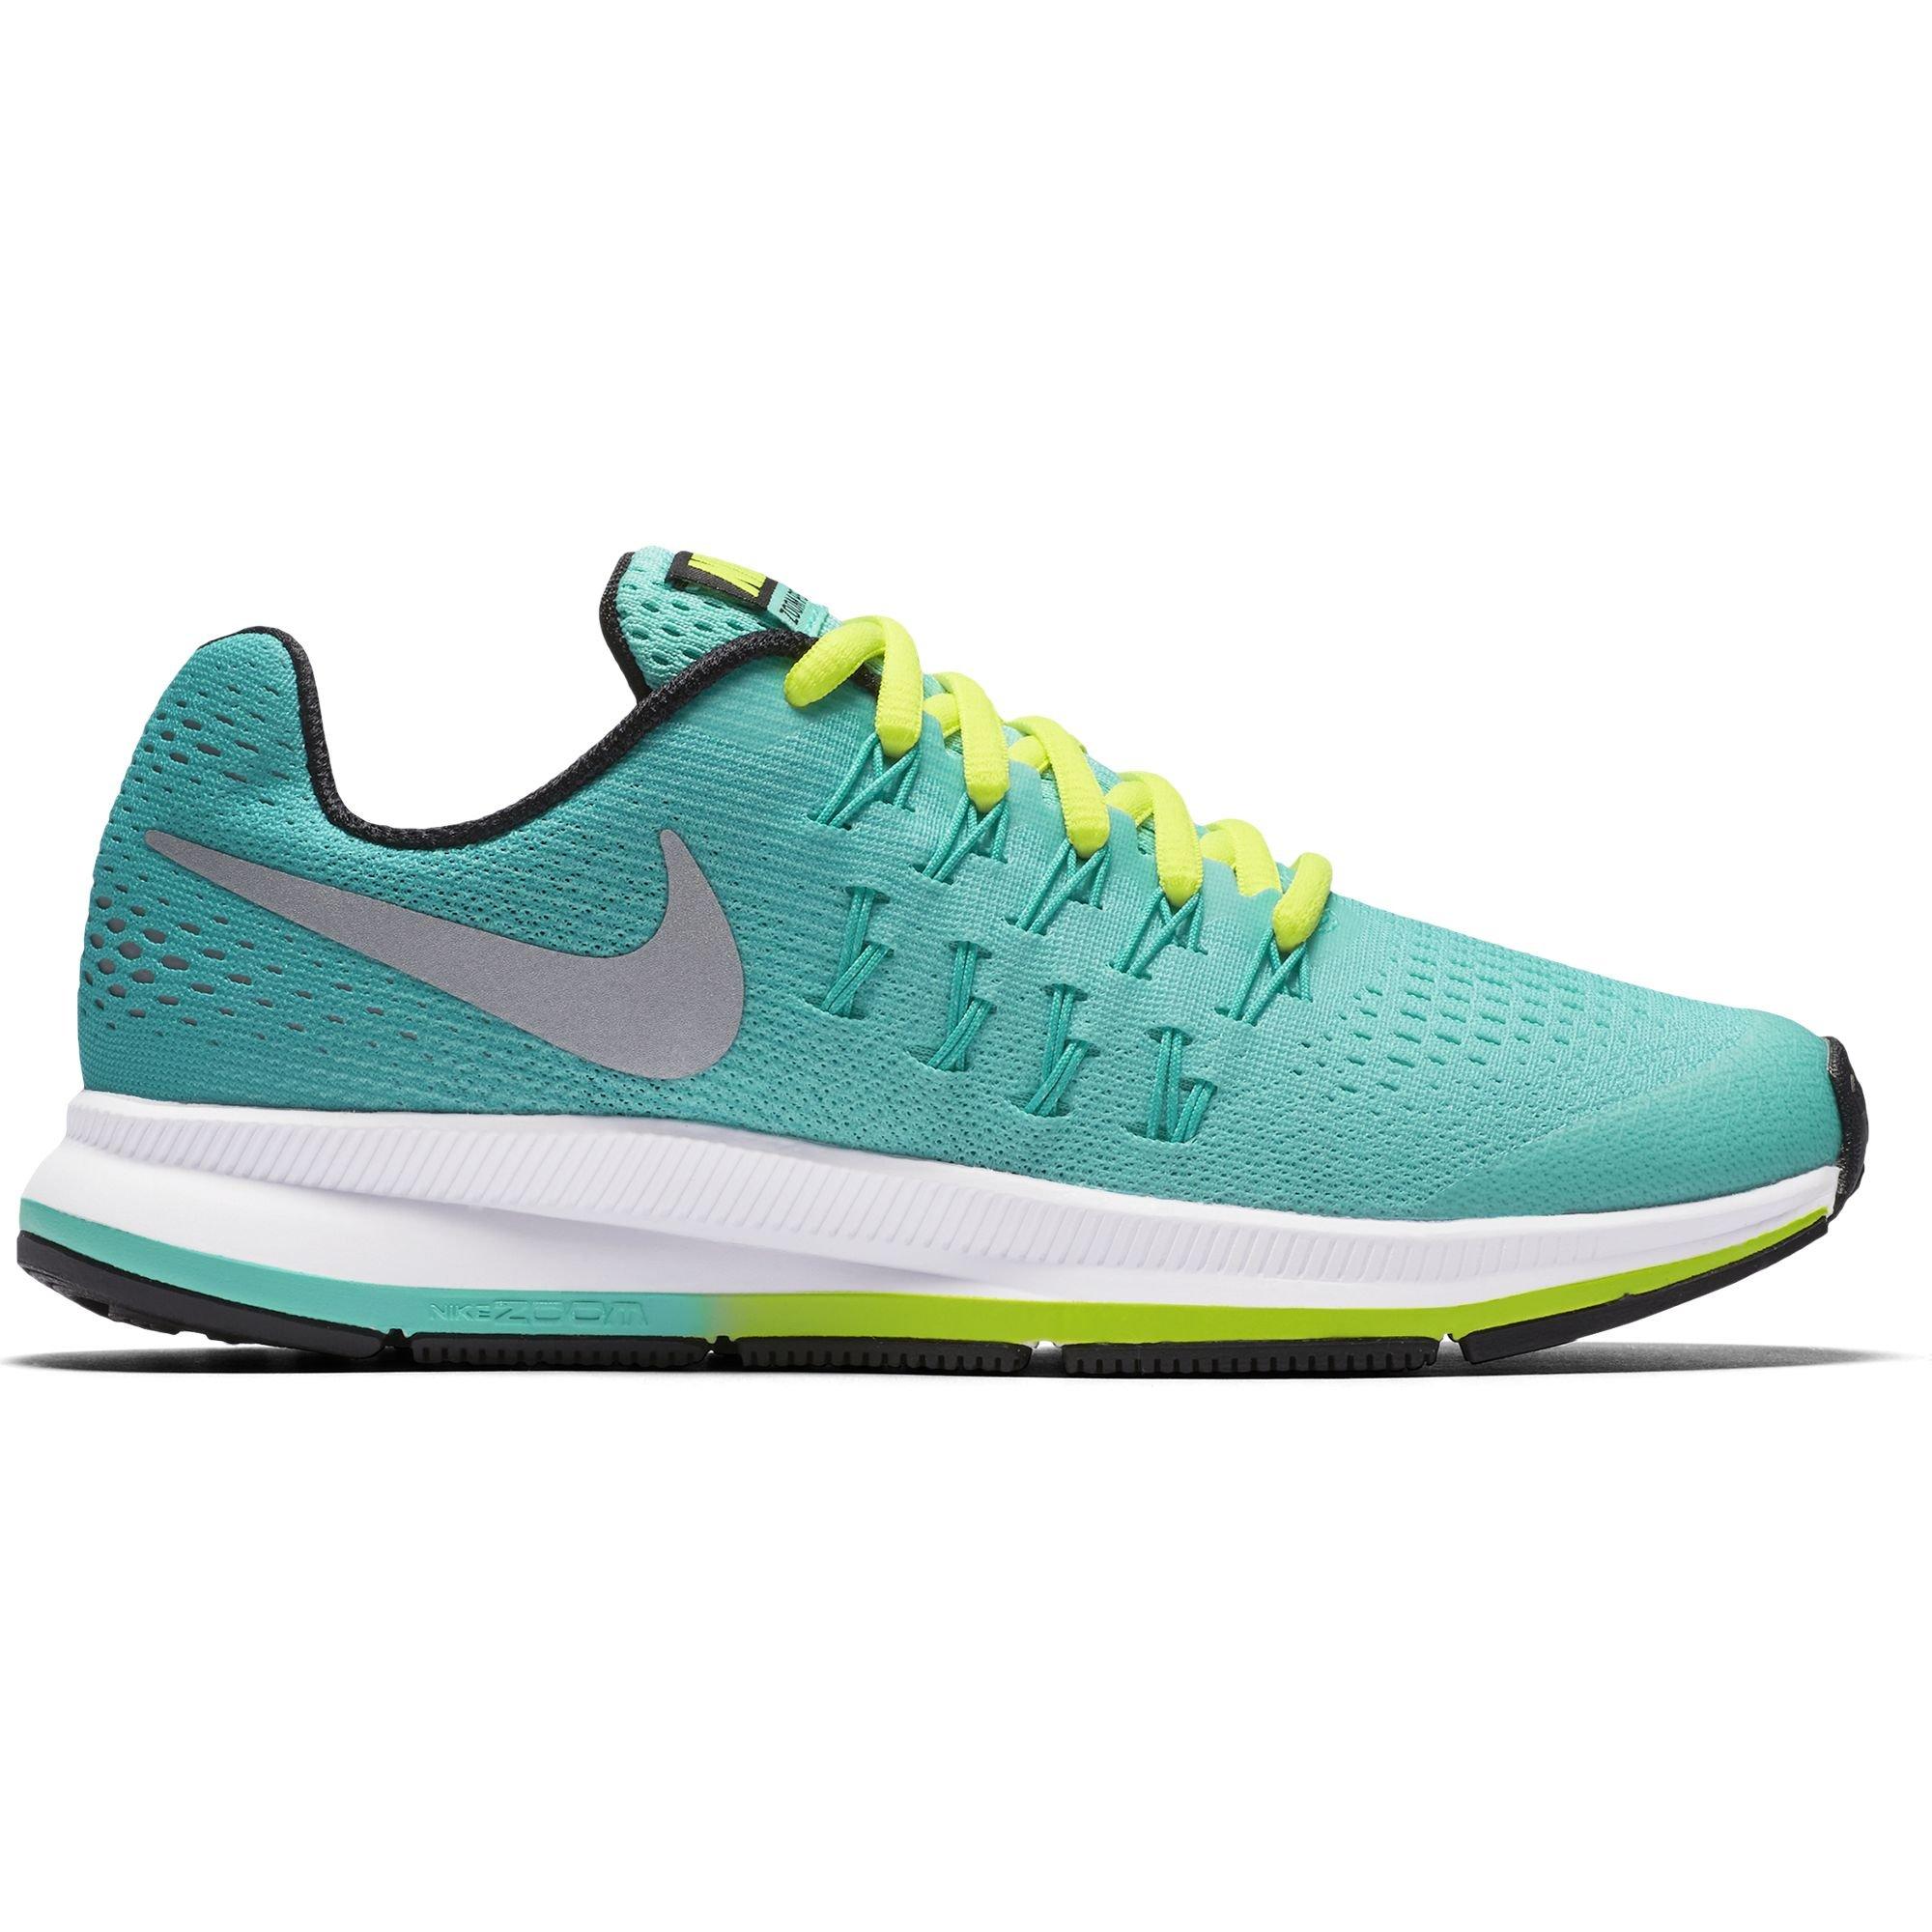 new arrival 8d800 6b797 Galleon - Nike Zoom Pegasus 33 (GS) Running Shoe Hyper Turquoise Metallic  Silver Jade, Size 4.5